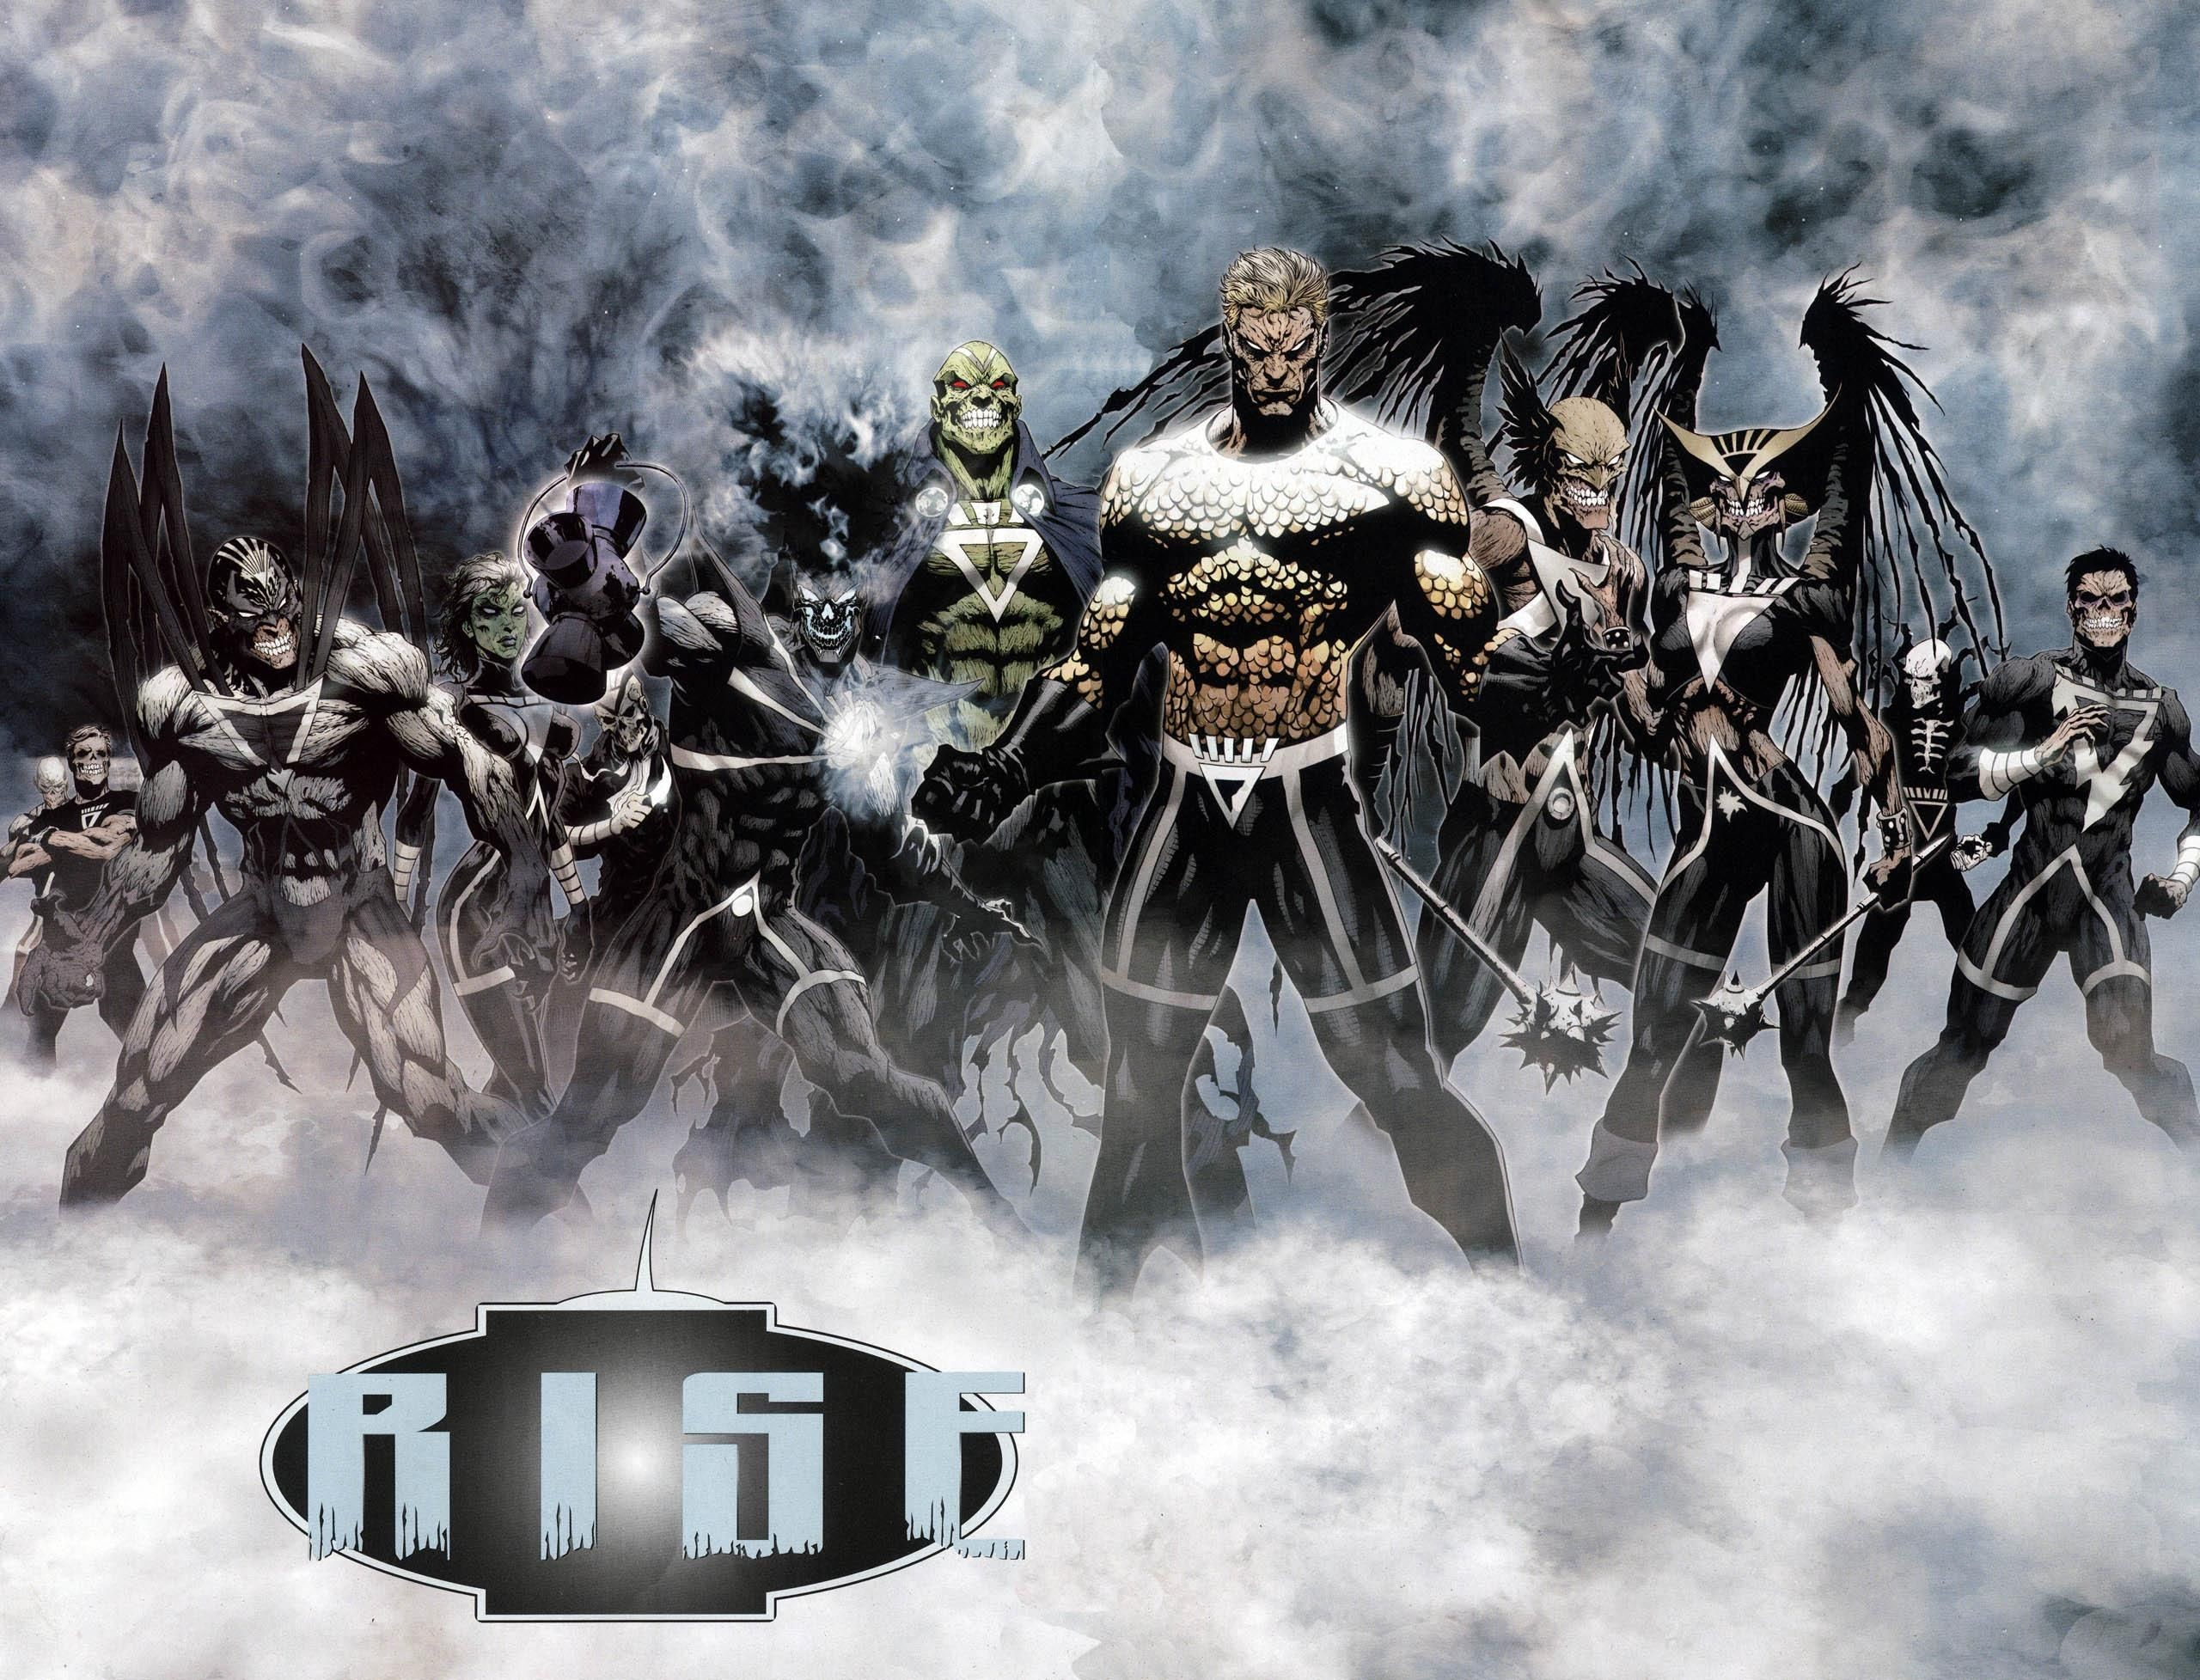 Res: 2560x1955, [Green Lantern] - Black Lantern Corps Rebirth